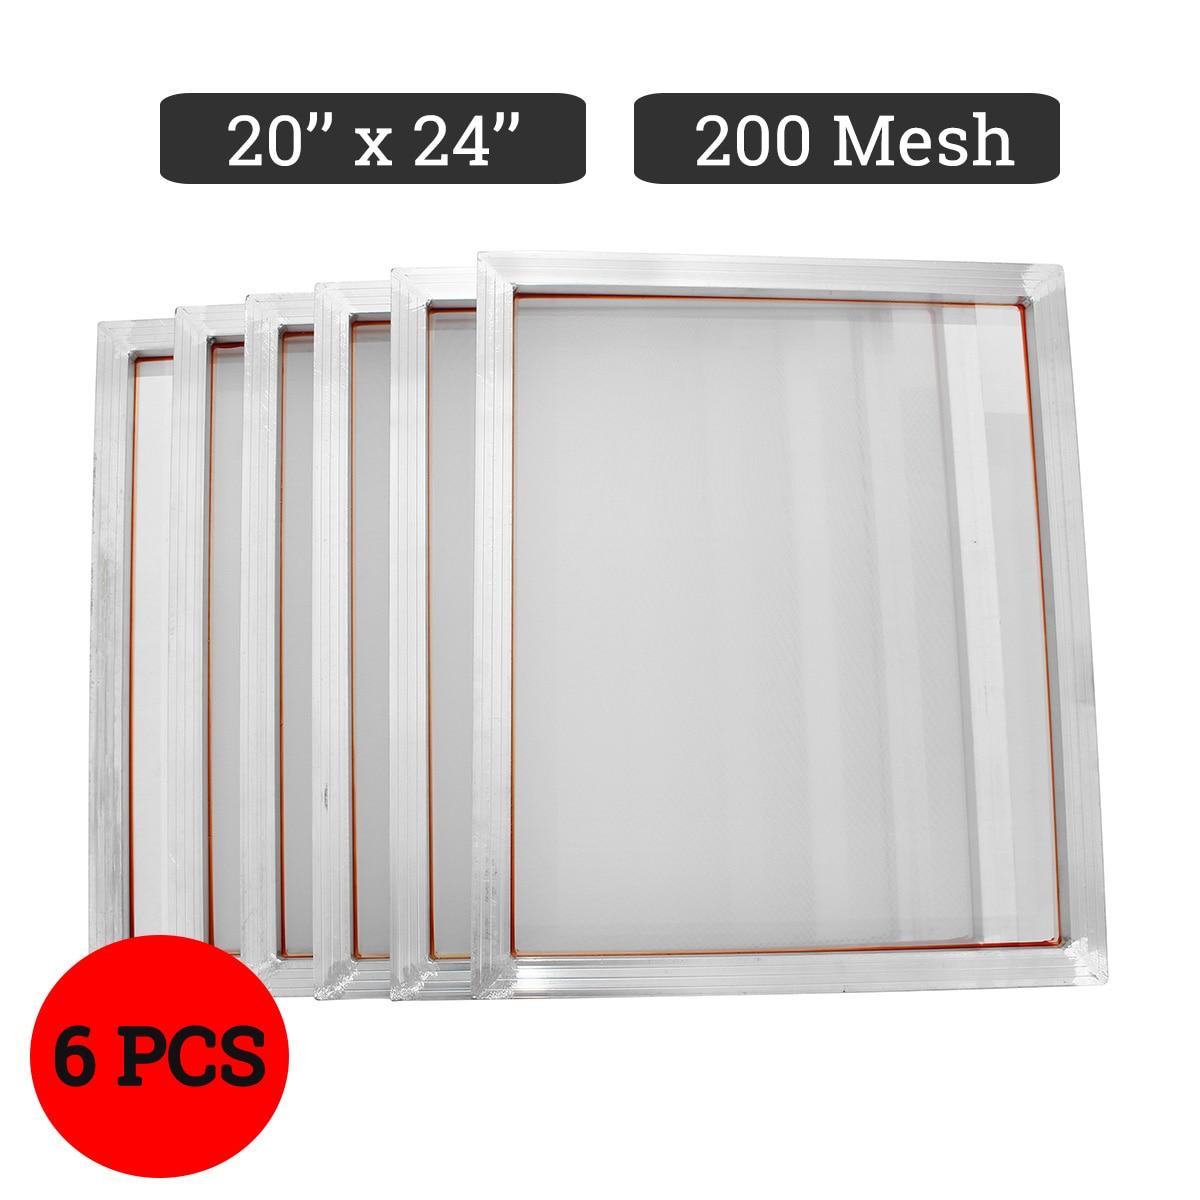 NEW 6pcs/set 200T Mesh Aluminum Silk Screen Printing Press Frame Screens White Out Size 50x60cmNEW 6pcs/set 200T Mesh Aluminum Silk Screen Printing Press Frame Screens White Out Size 50x60cm